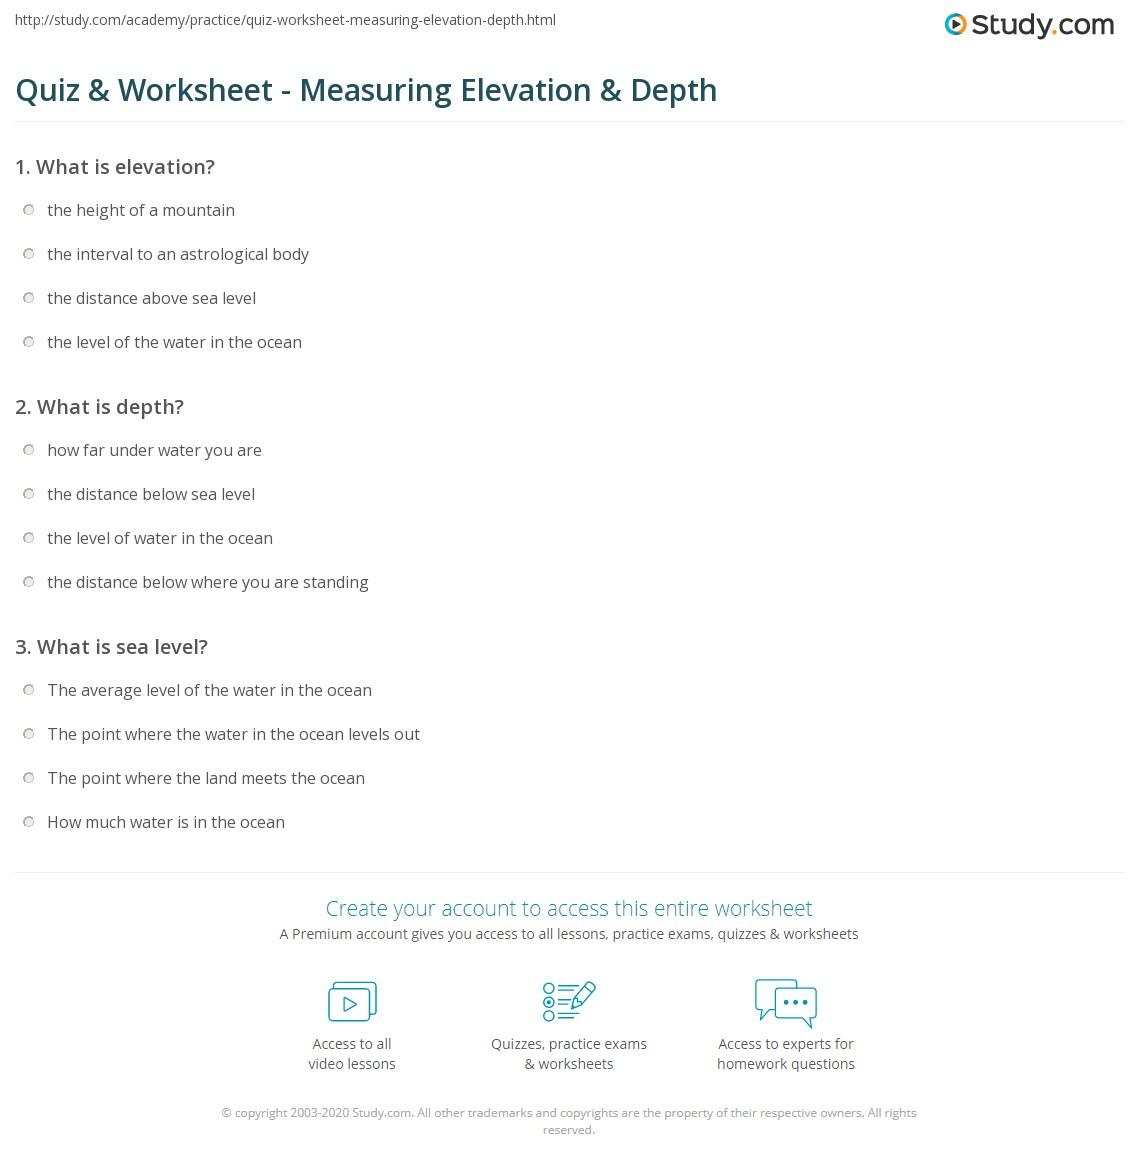 Quiz Worksheet Measuring Elevation Depth Studycom - How to determine sea level elevation